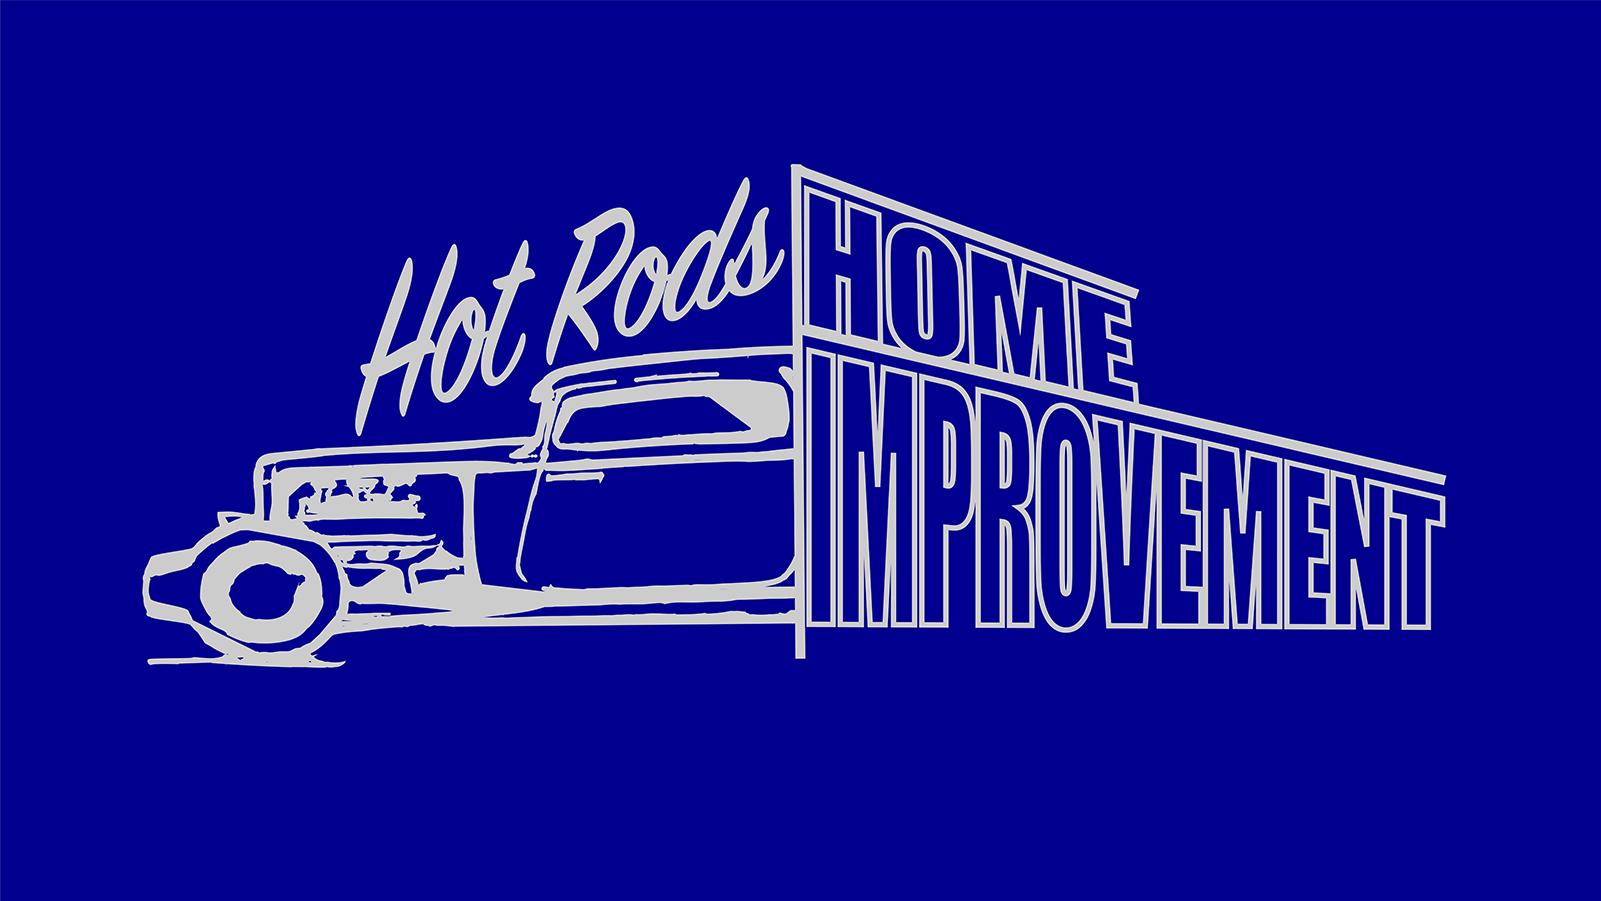 Hot Rods & Home Improvement — Texas